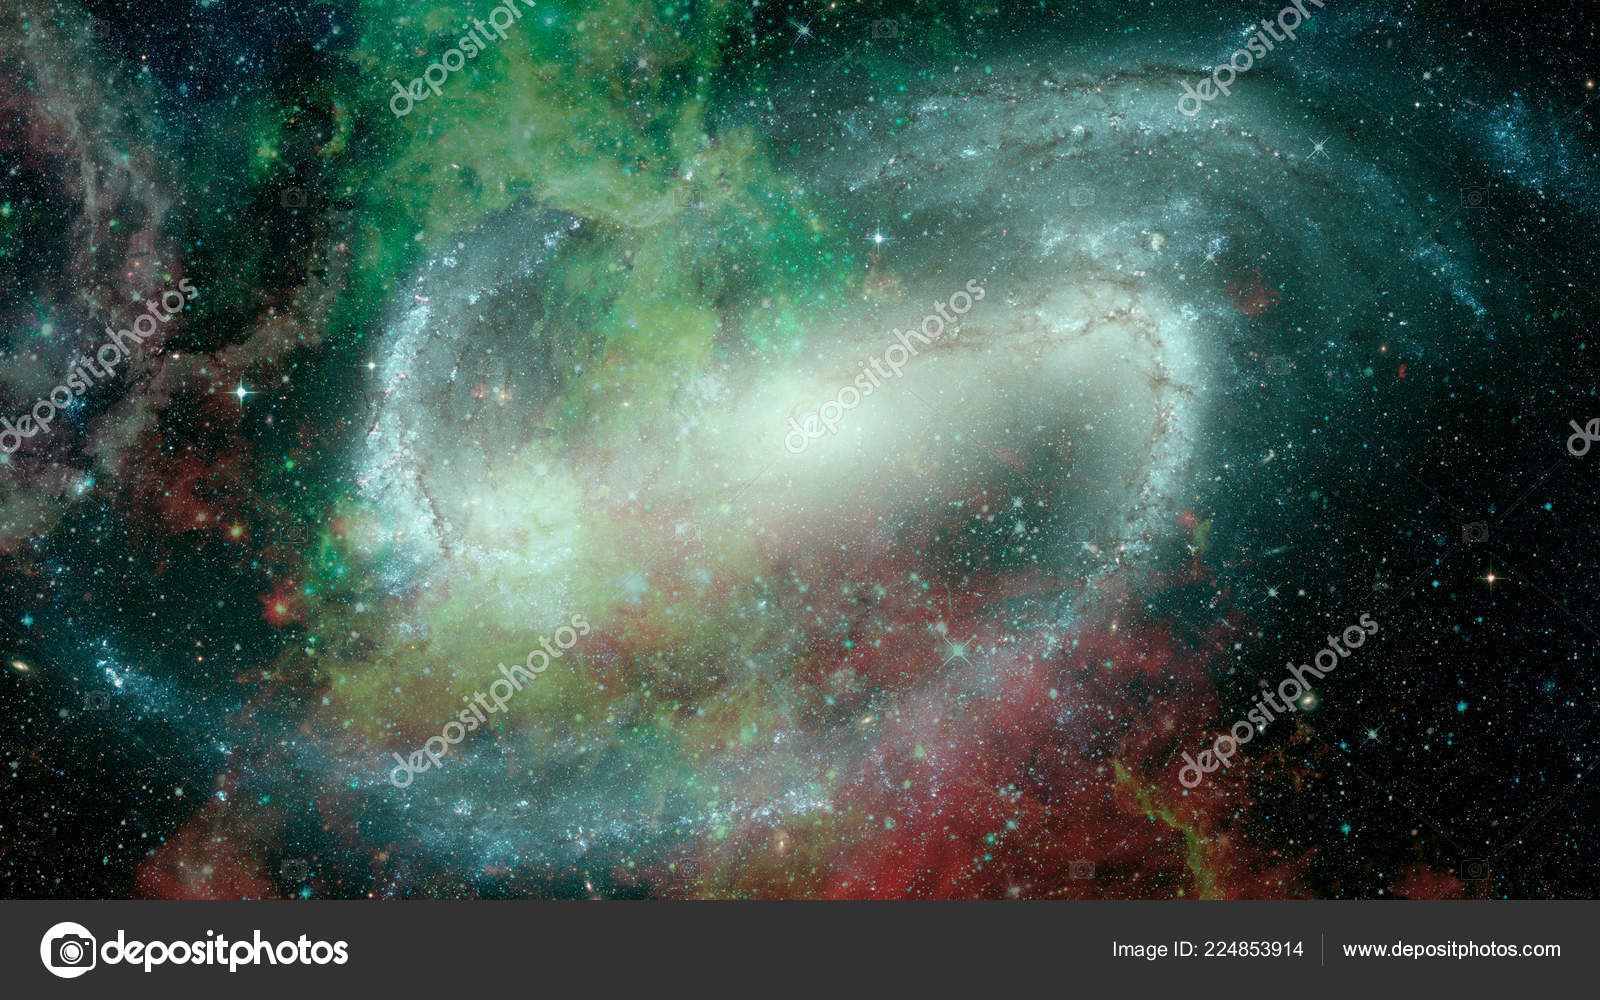 Abstract Bright Colorful Universe Nebula Night Starry Sky Rainbow